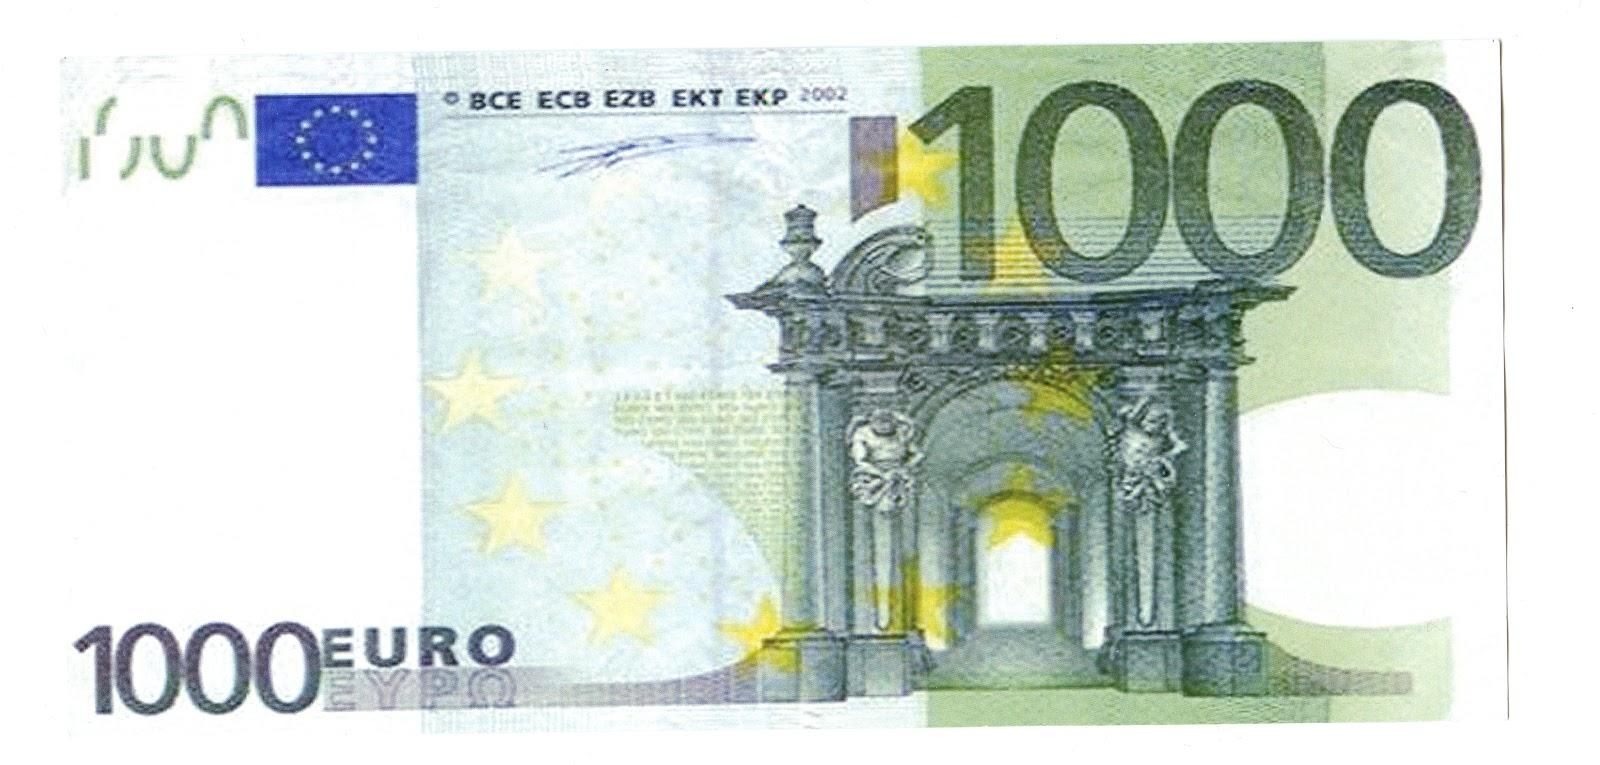 http://3.bp.blogspot.com/-LlnEIigJsDQ/T1D6POw3dEI/AAAAAAAACA8/SOZzJnjAvlo/s1600/Attac+Bonn+1000+Euro+Schein+Vorderseite.jpg